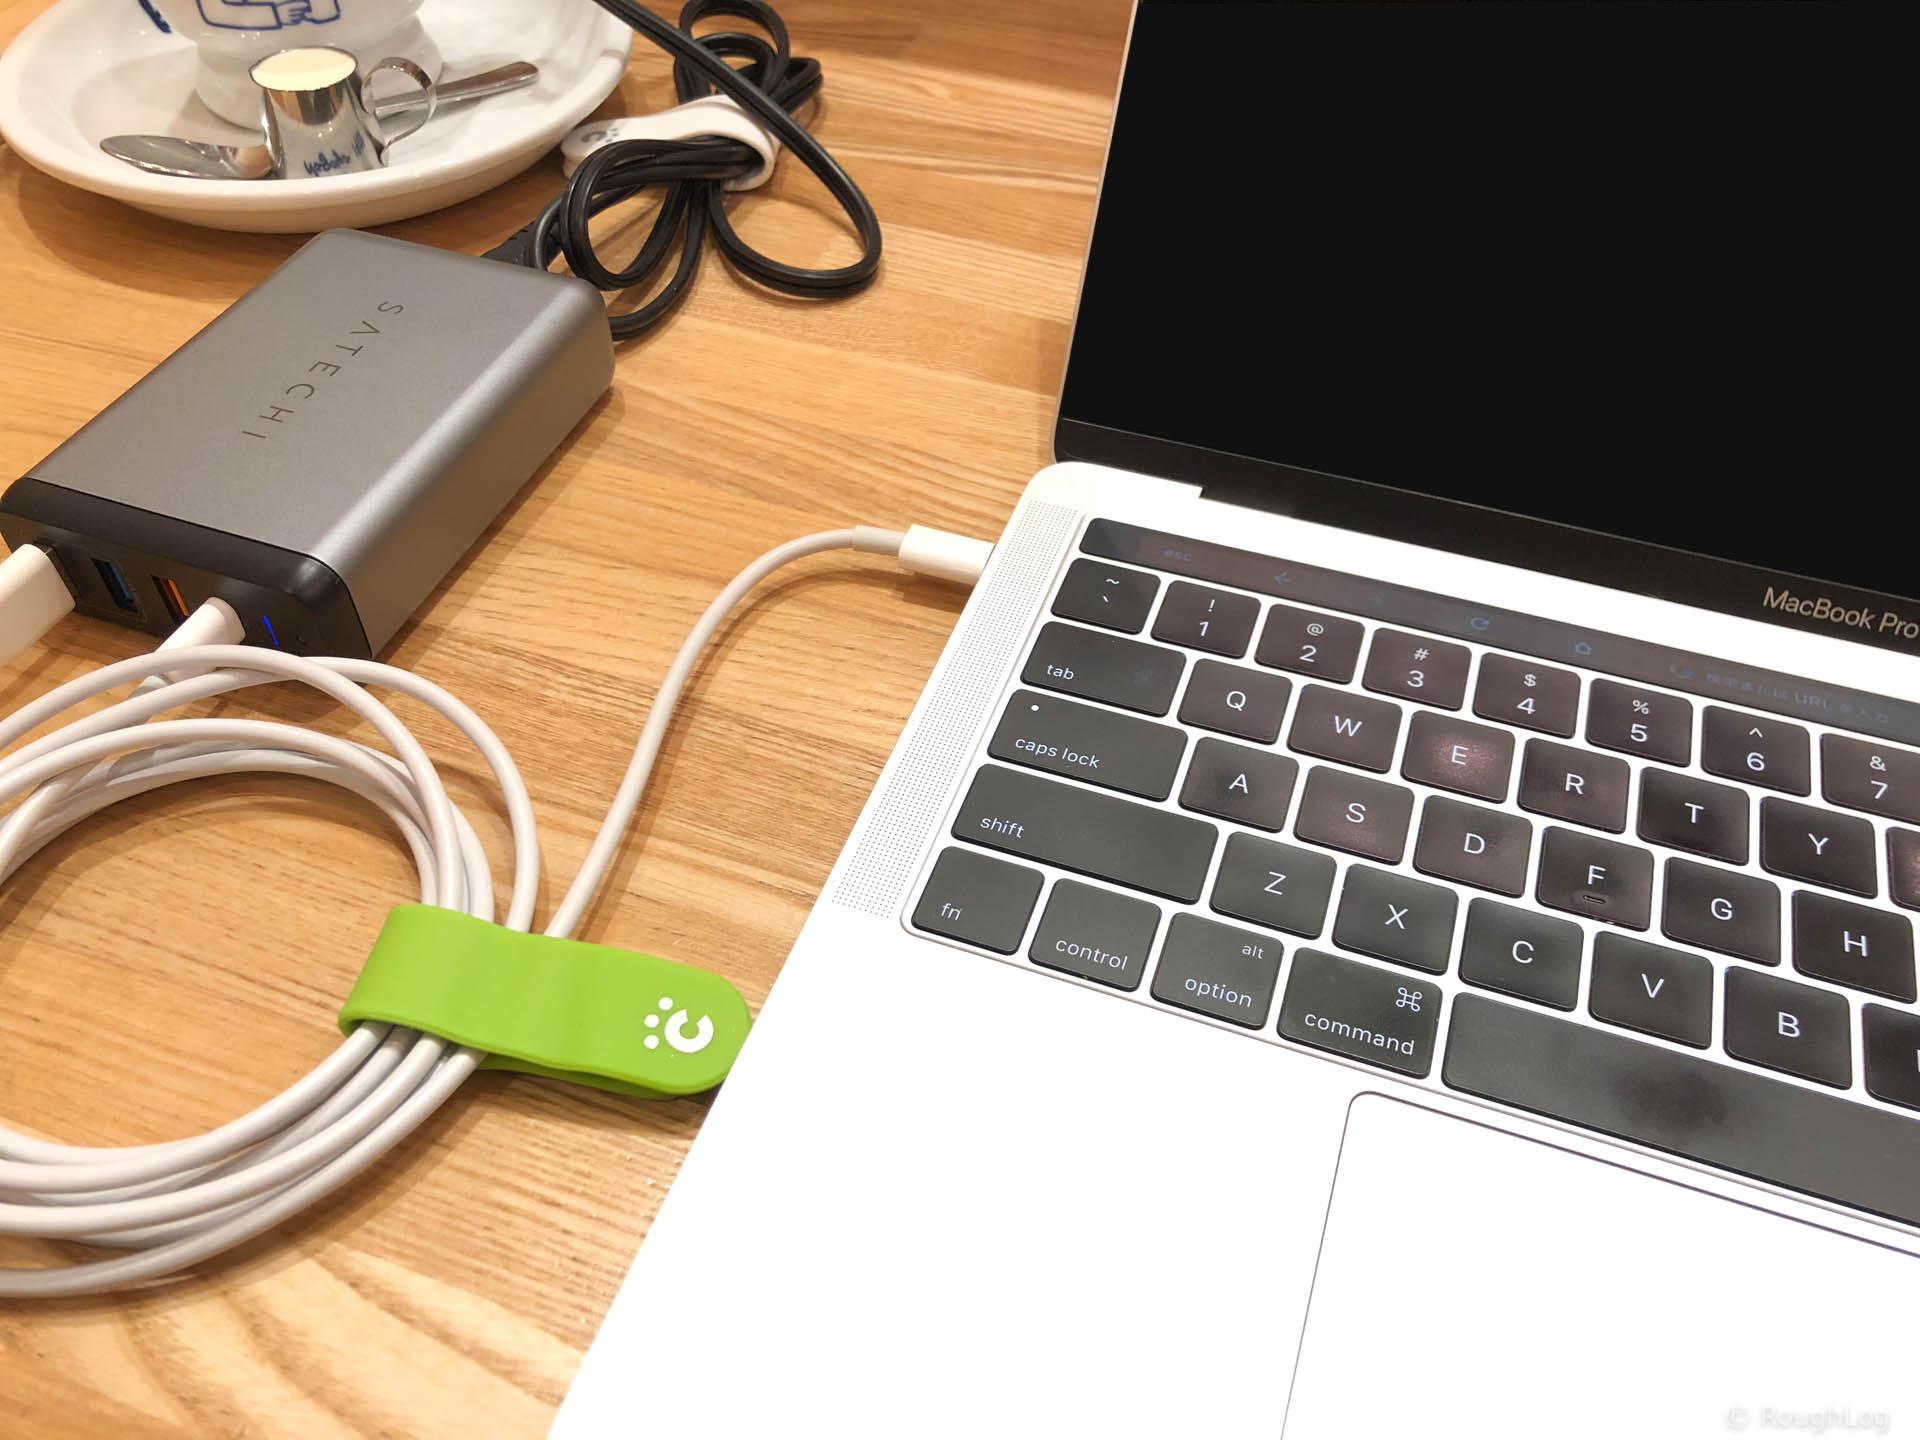 MacBook Proを充電中